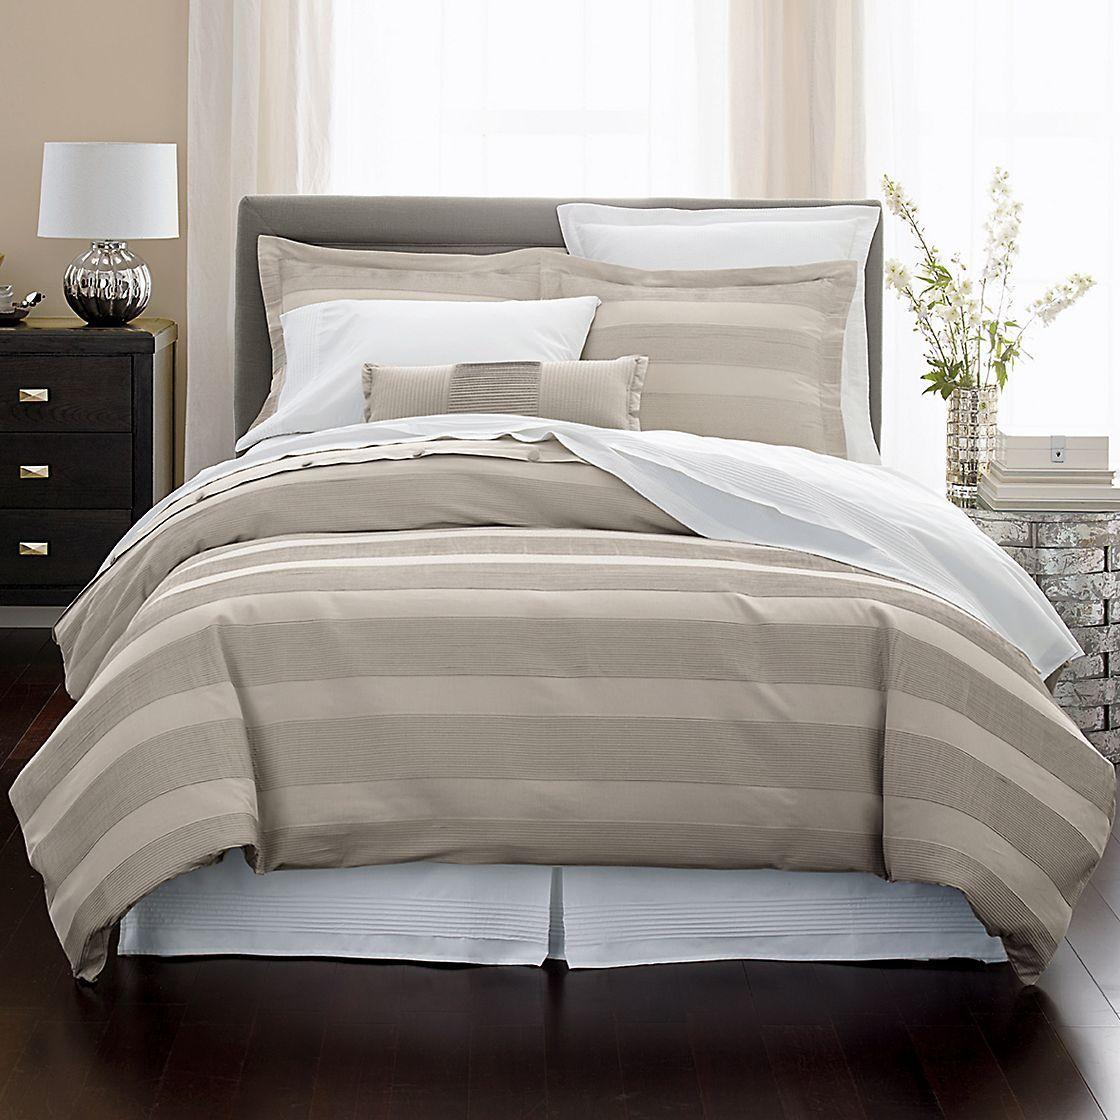 Charisma Isabella Sheets & Bedding Set | The Company Store $200 Q $230 K